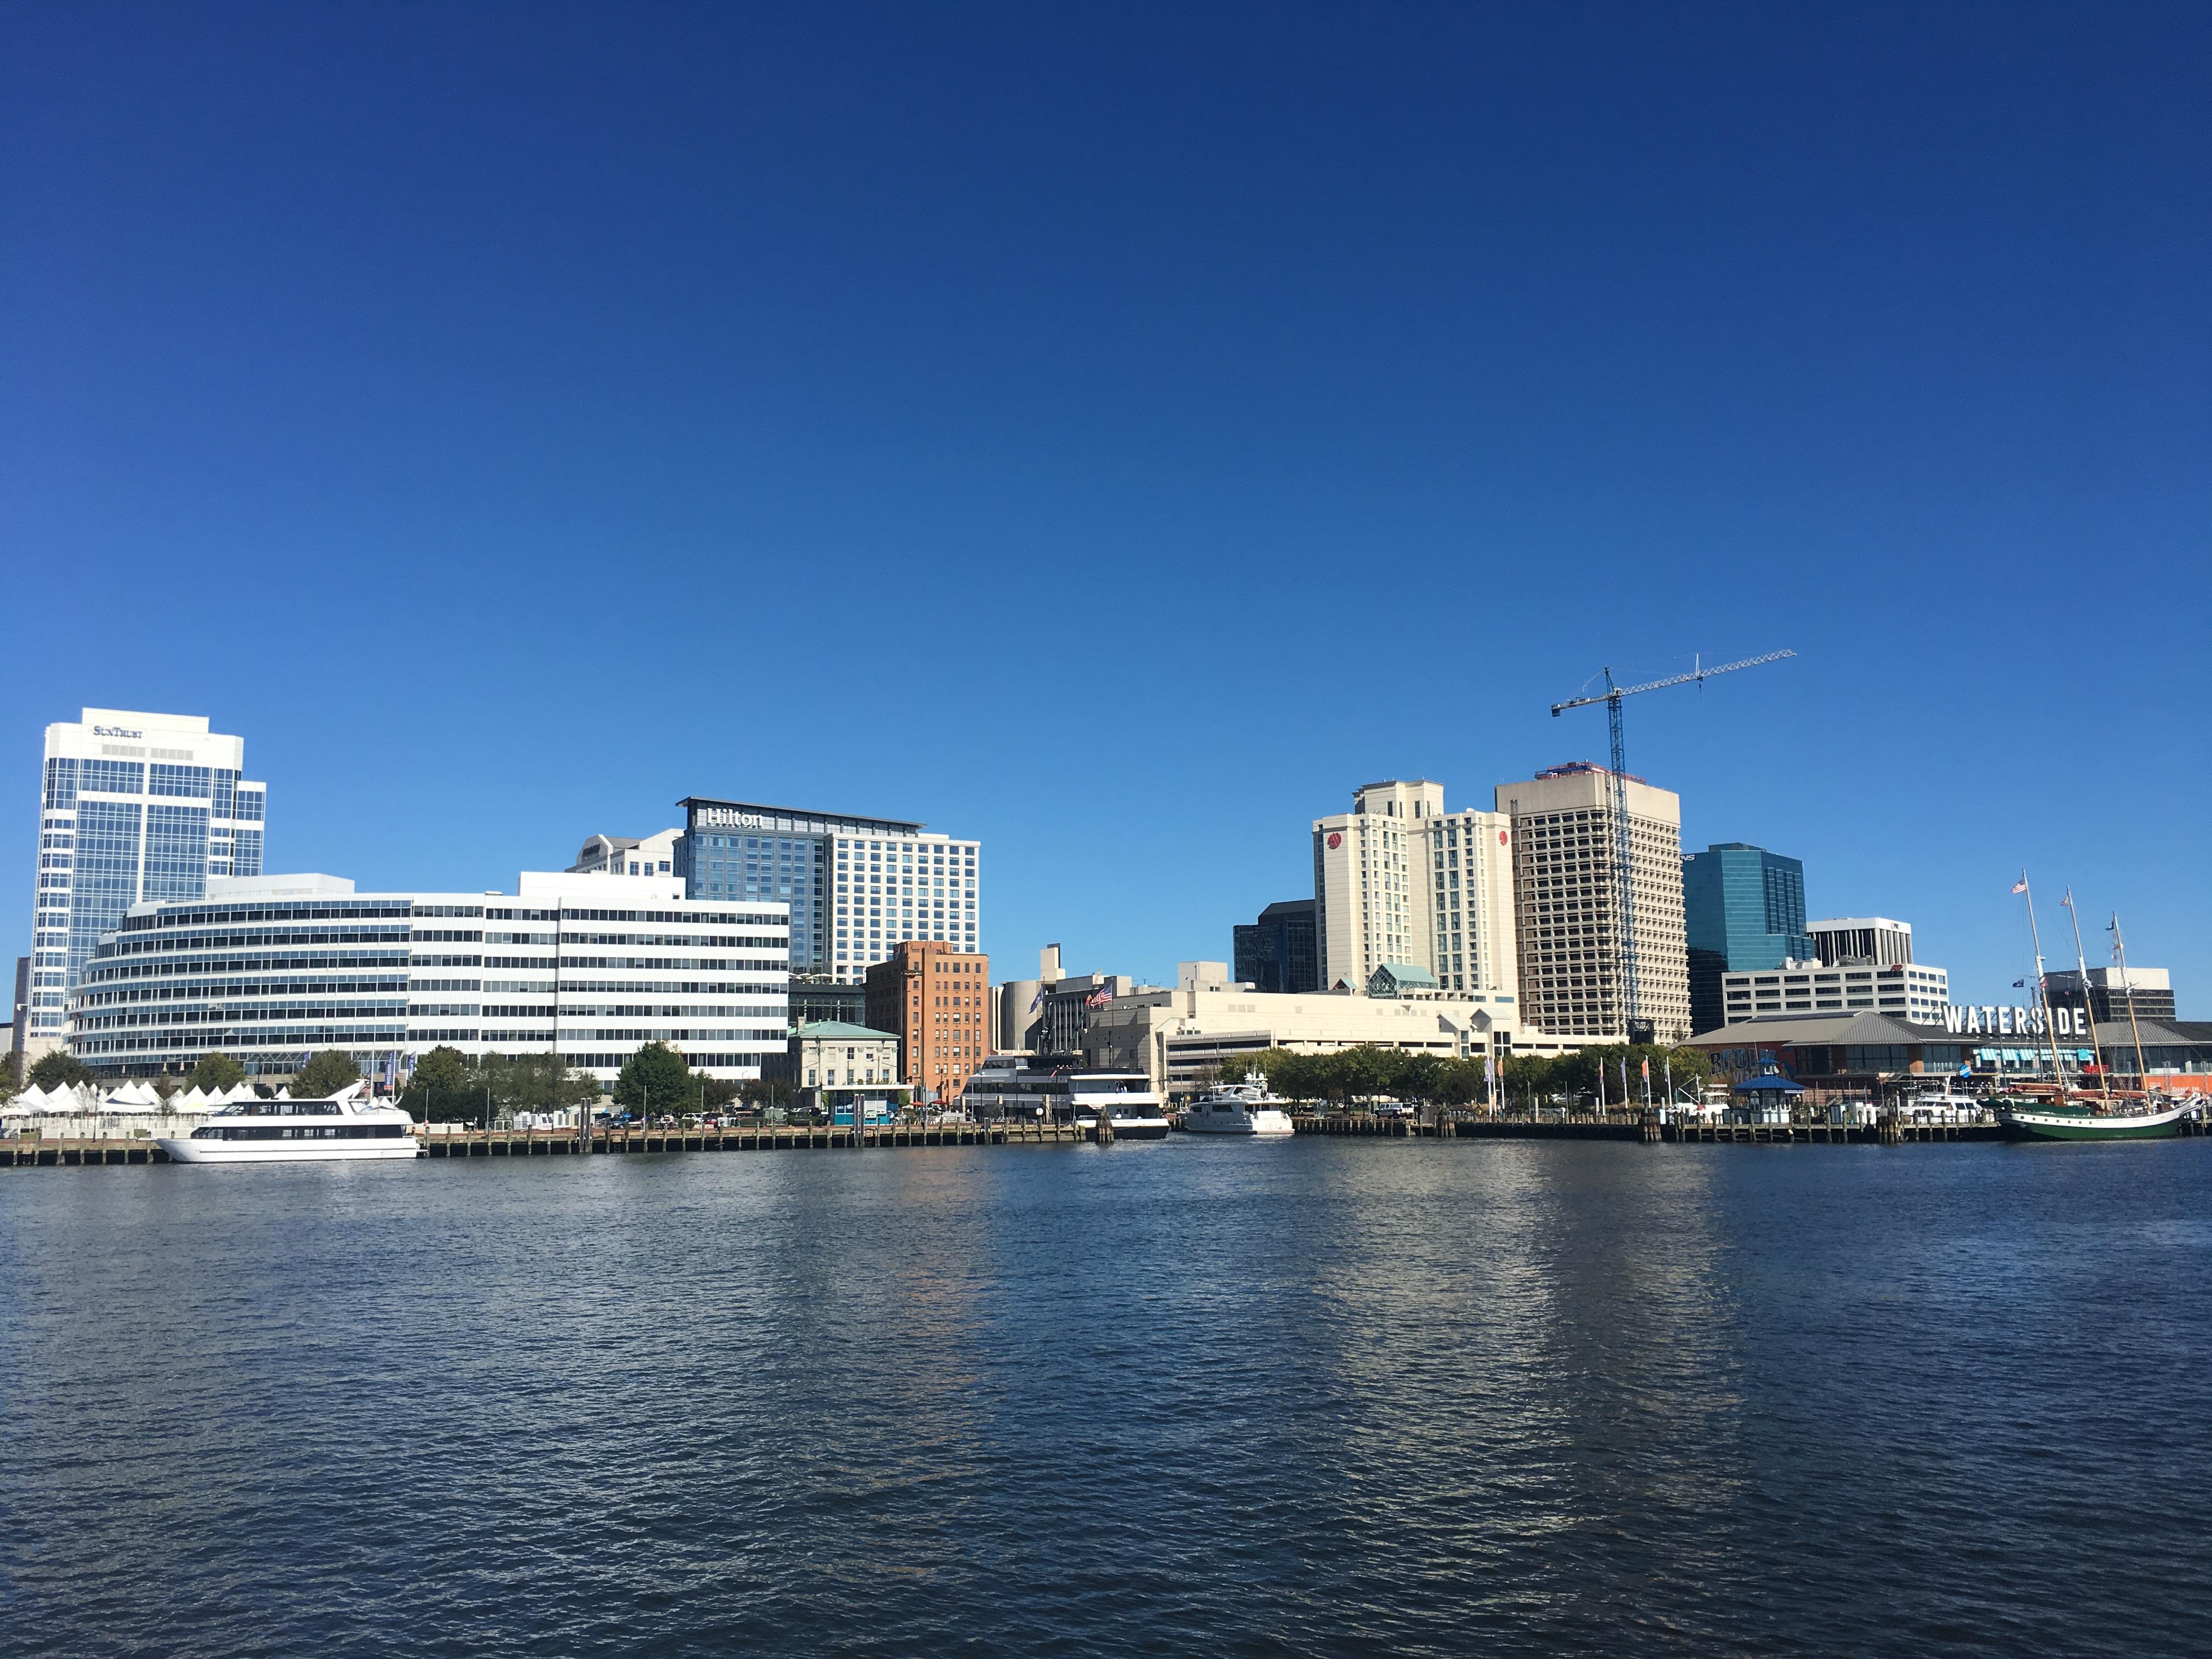 Norfolk VA - Waterfront